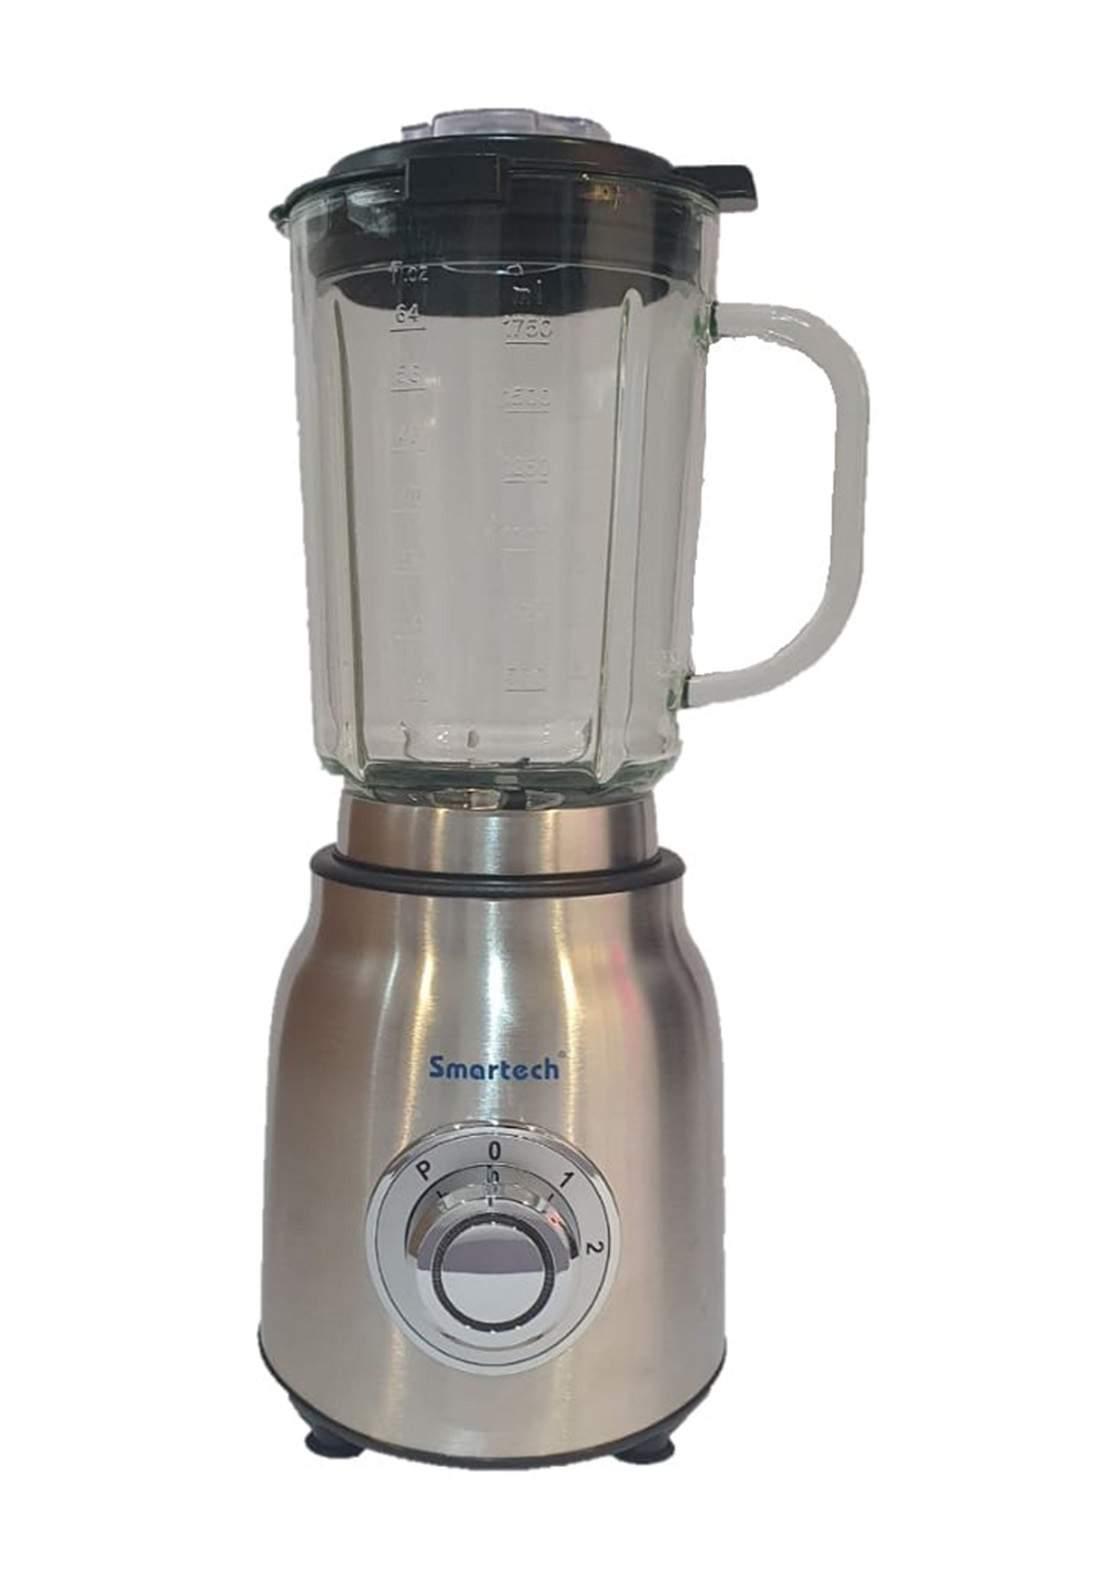 Smartech 800 خلاط زجاجي  من